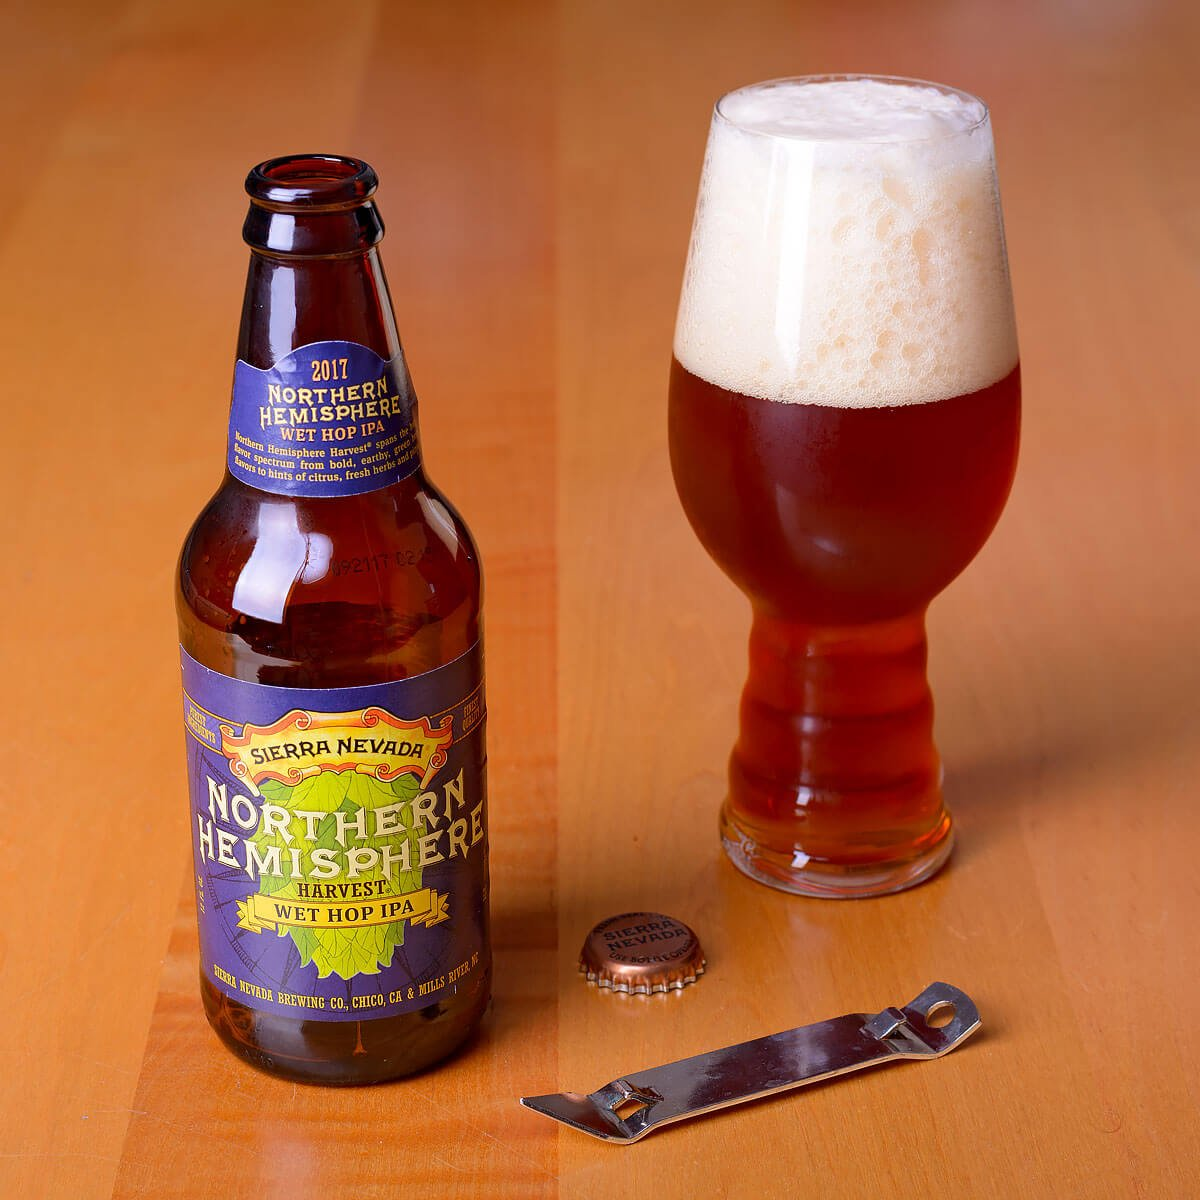 Northern Hemisphere Harvest, an American IPA by Sierra Nevada Brewing Co.